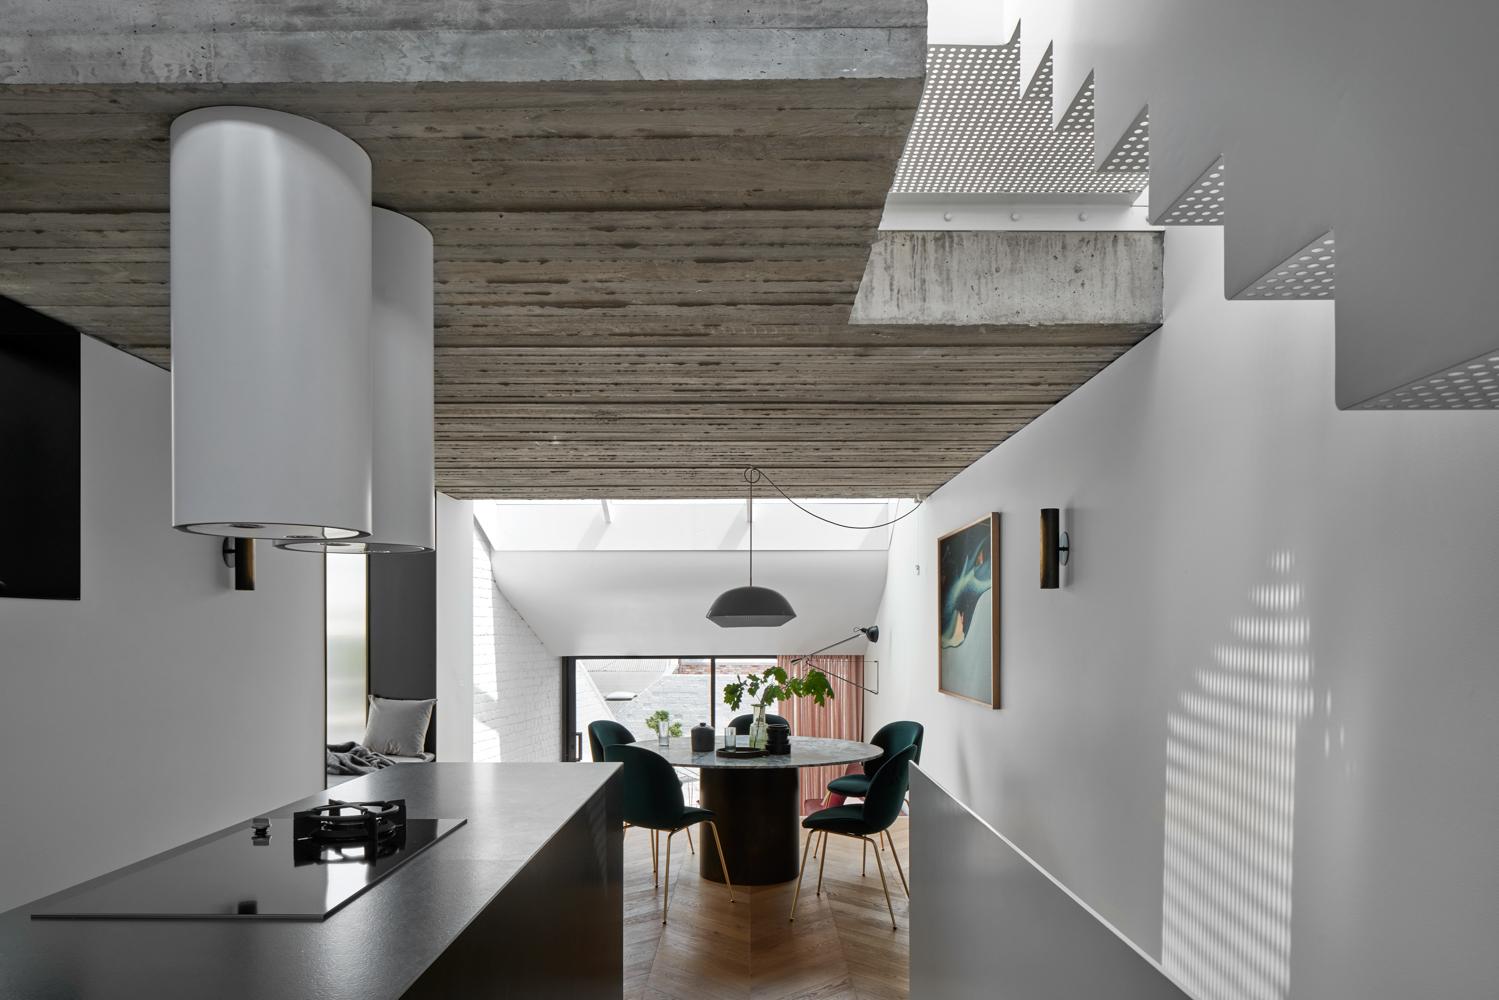 Home concrete interior